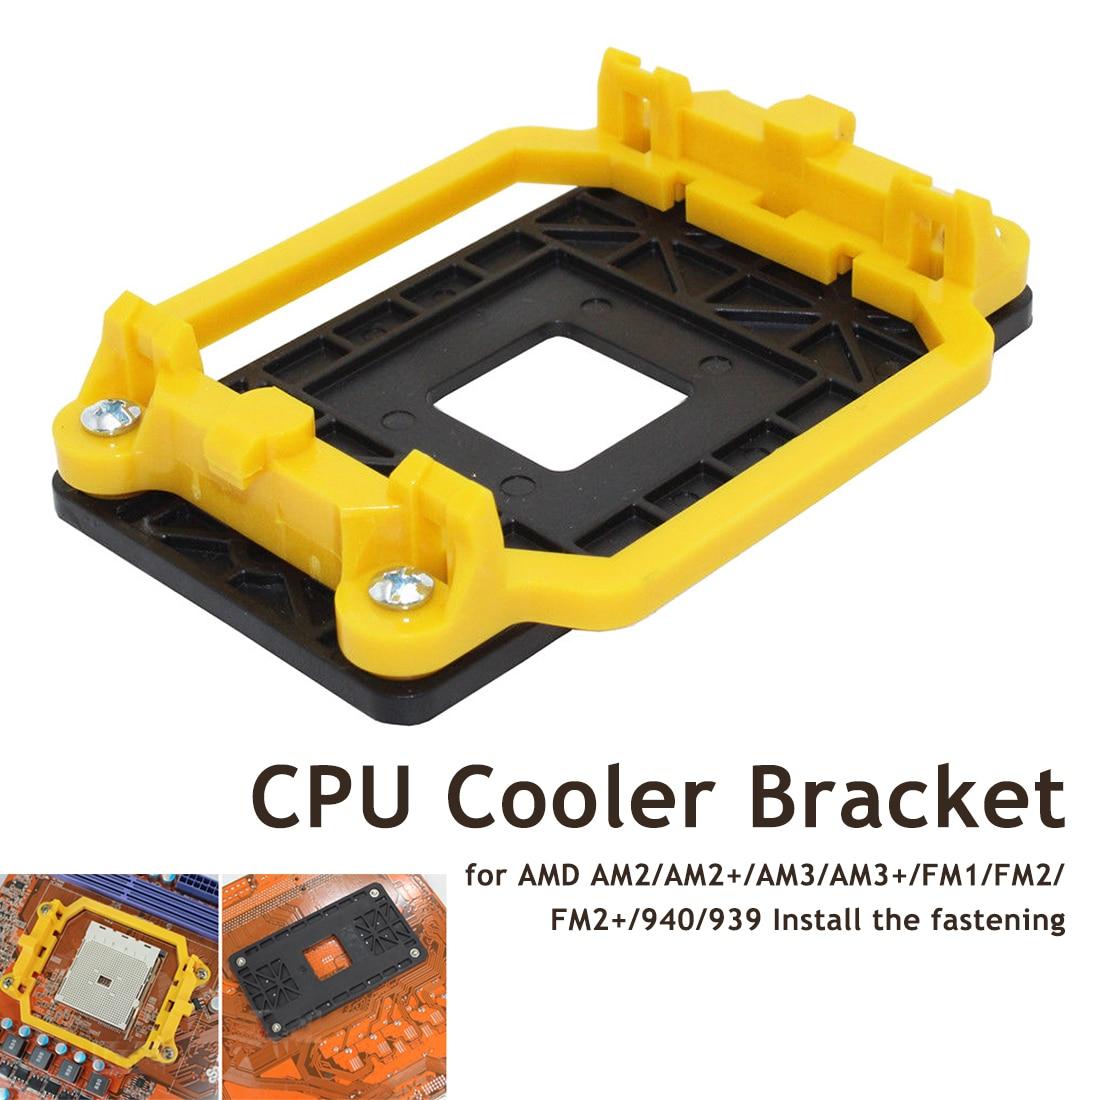 Etmakit качественный процессор кулер кронштейн материнская плата для AMD AM2/AM2 +/AM3/AM3 +/FM1/FM2/FM2 +/940/939 установите крепление